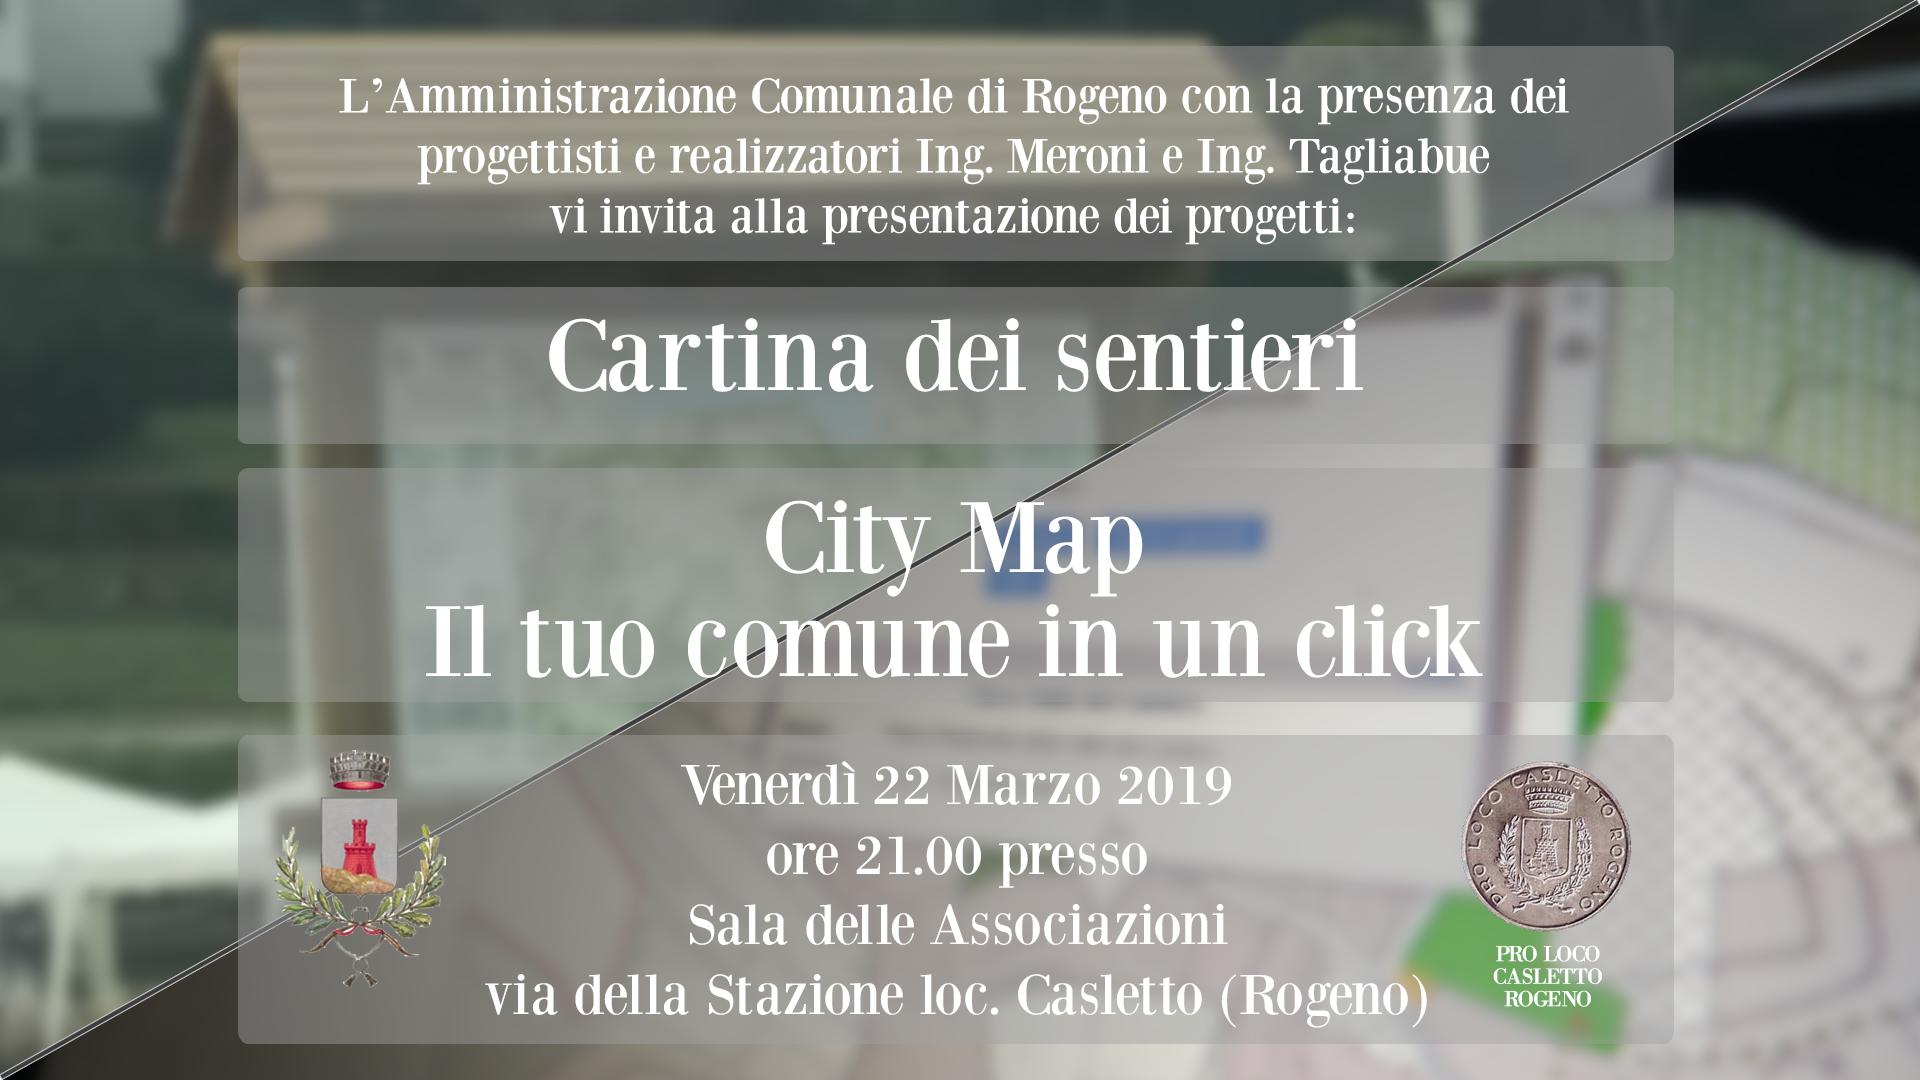 Copertina FB cartina city map Rogeno